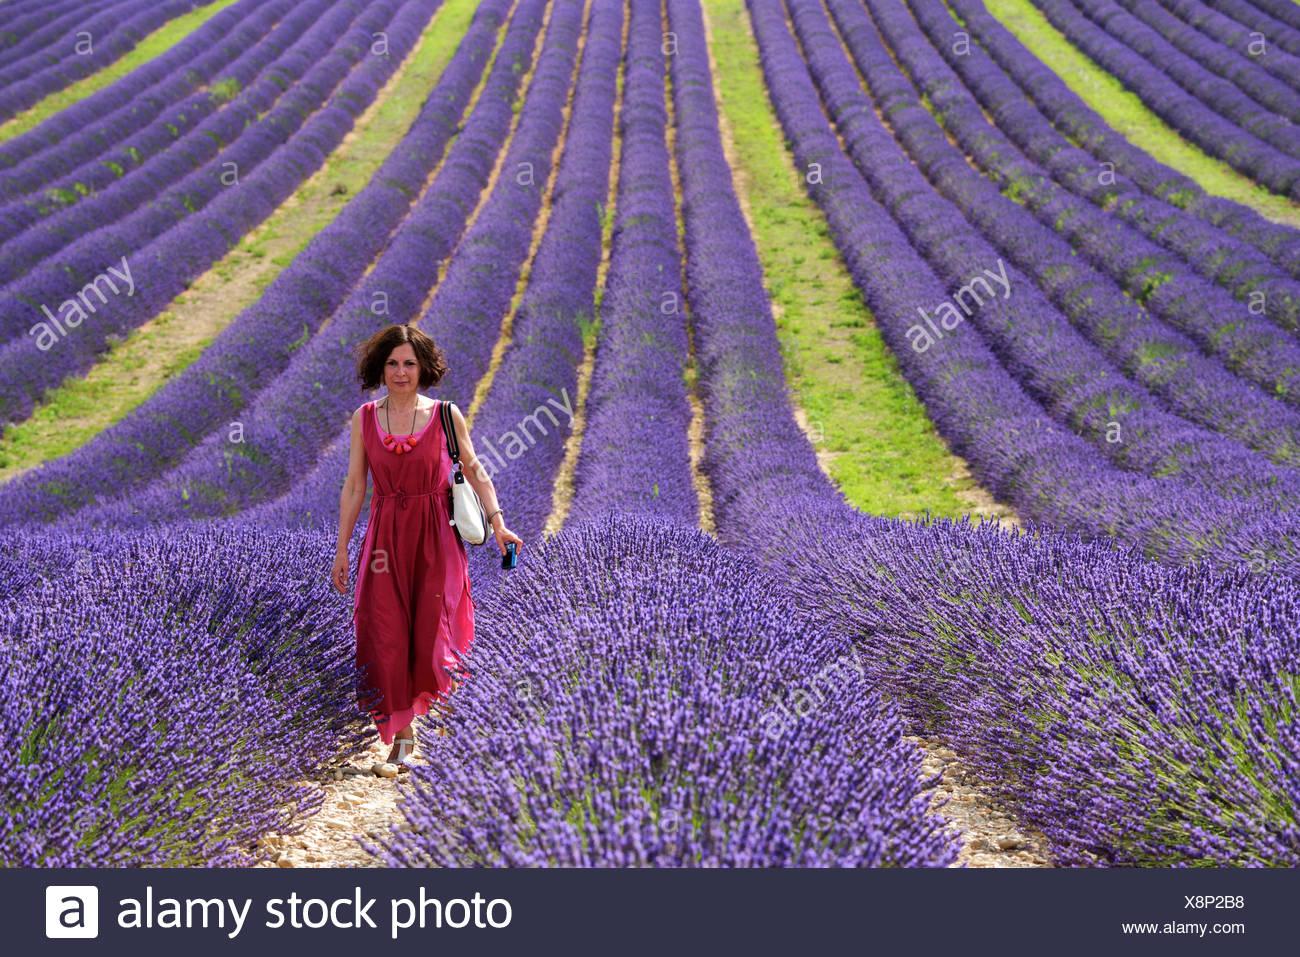 Europe, France, Provence-Alpes-Côte d'Azur, Provence, Valensole, Lavender, woman, lady, red, dress - Stock Image